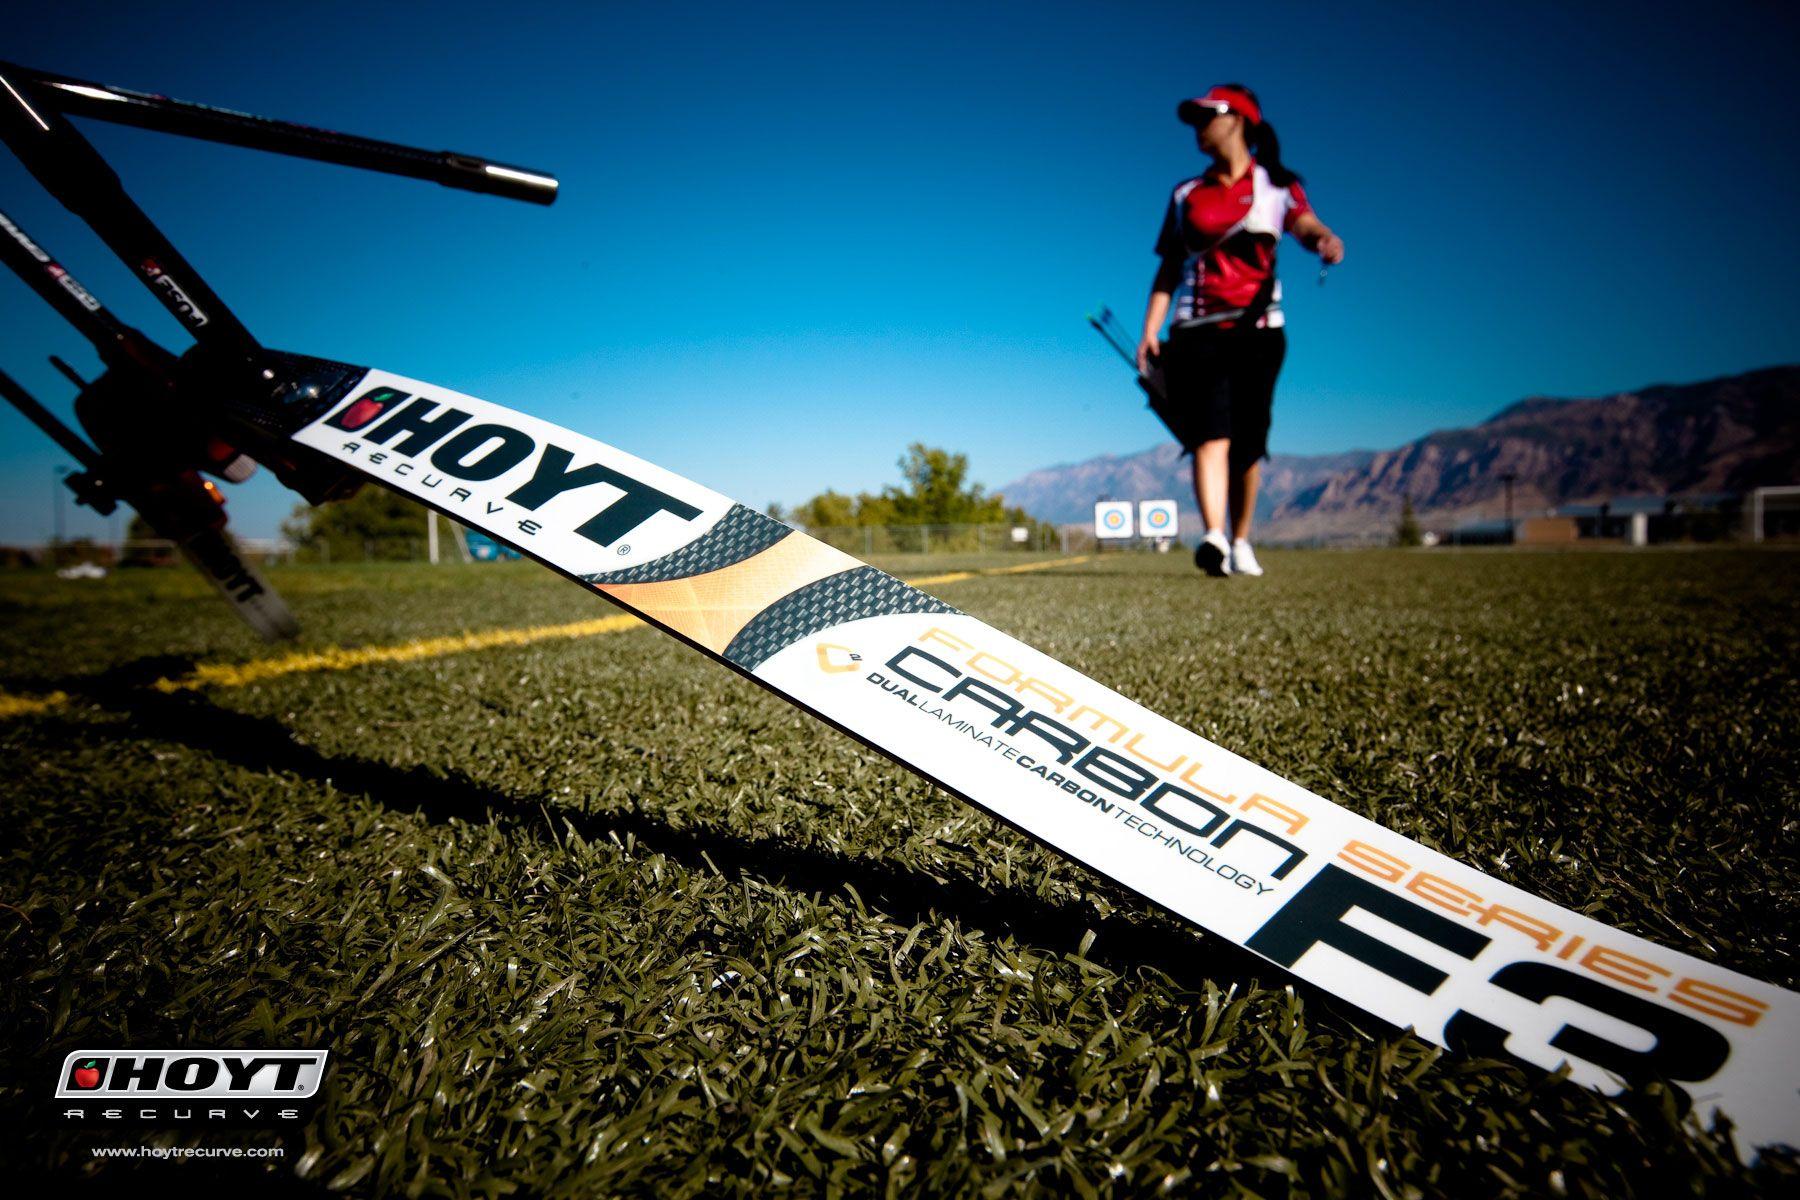 Archery Hoyt Archery Hoyt Archery Olympic Recurve Bow